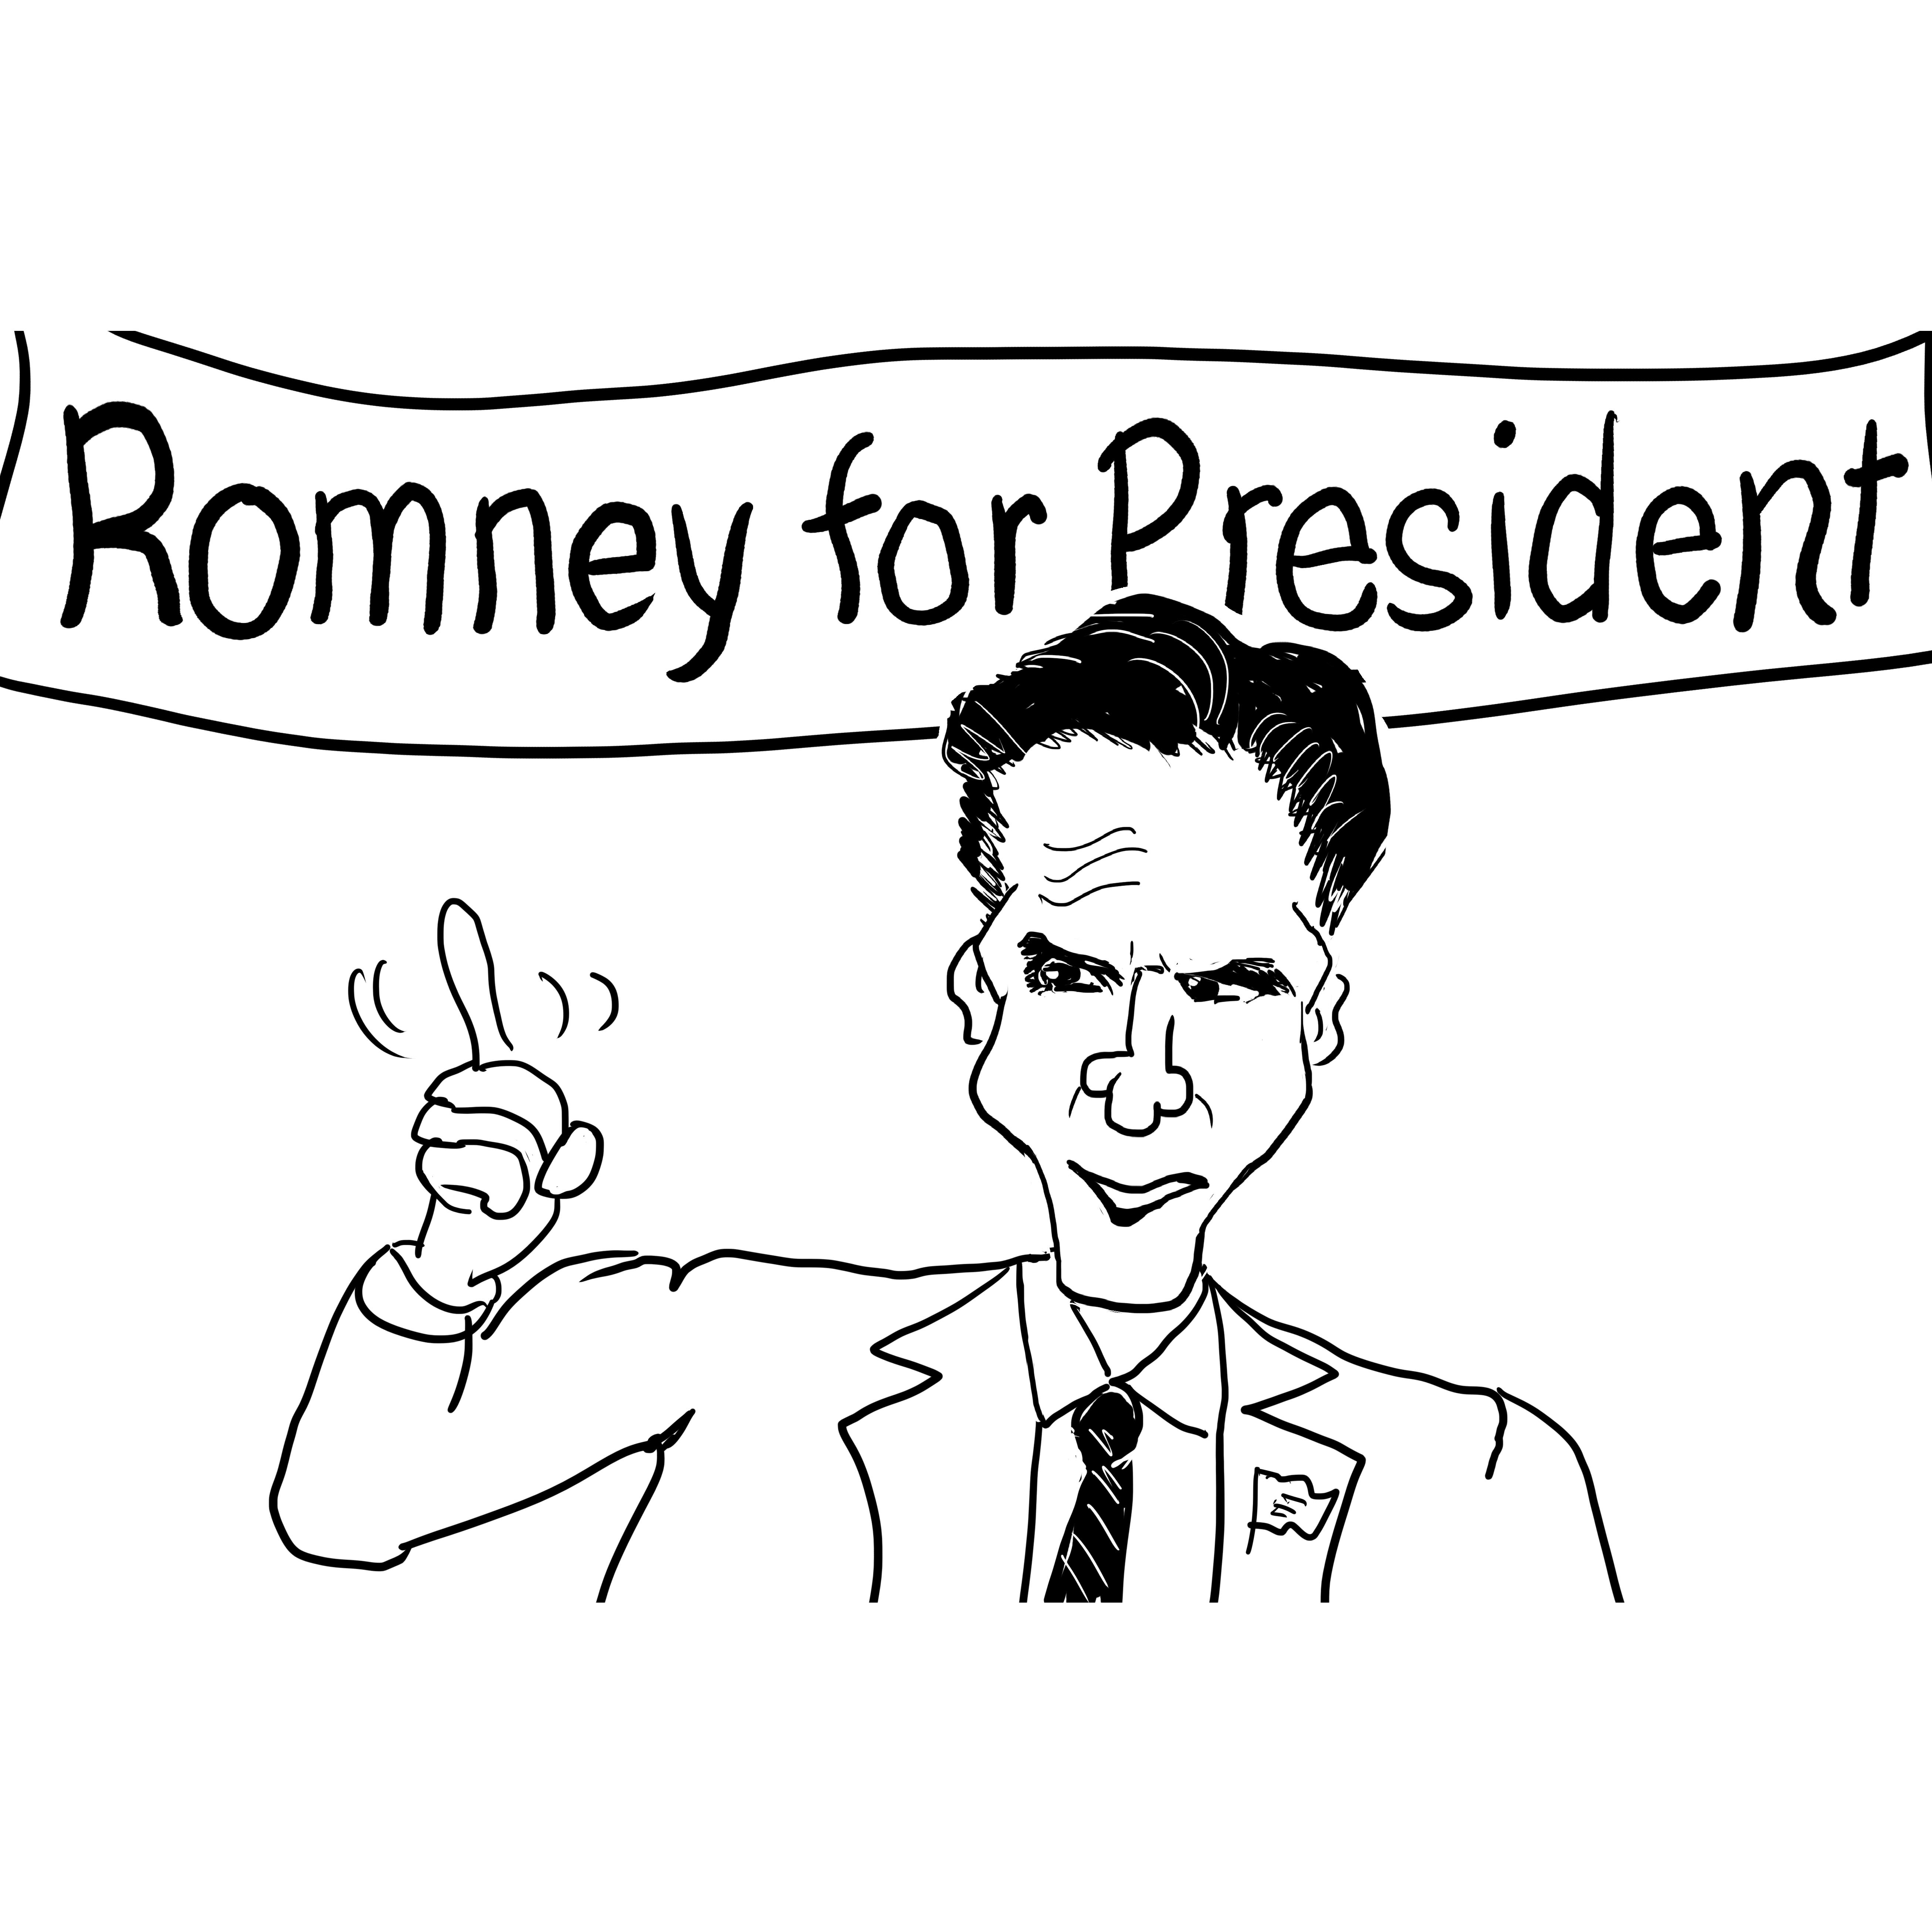 Romney reverses?